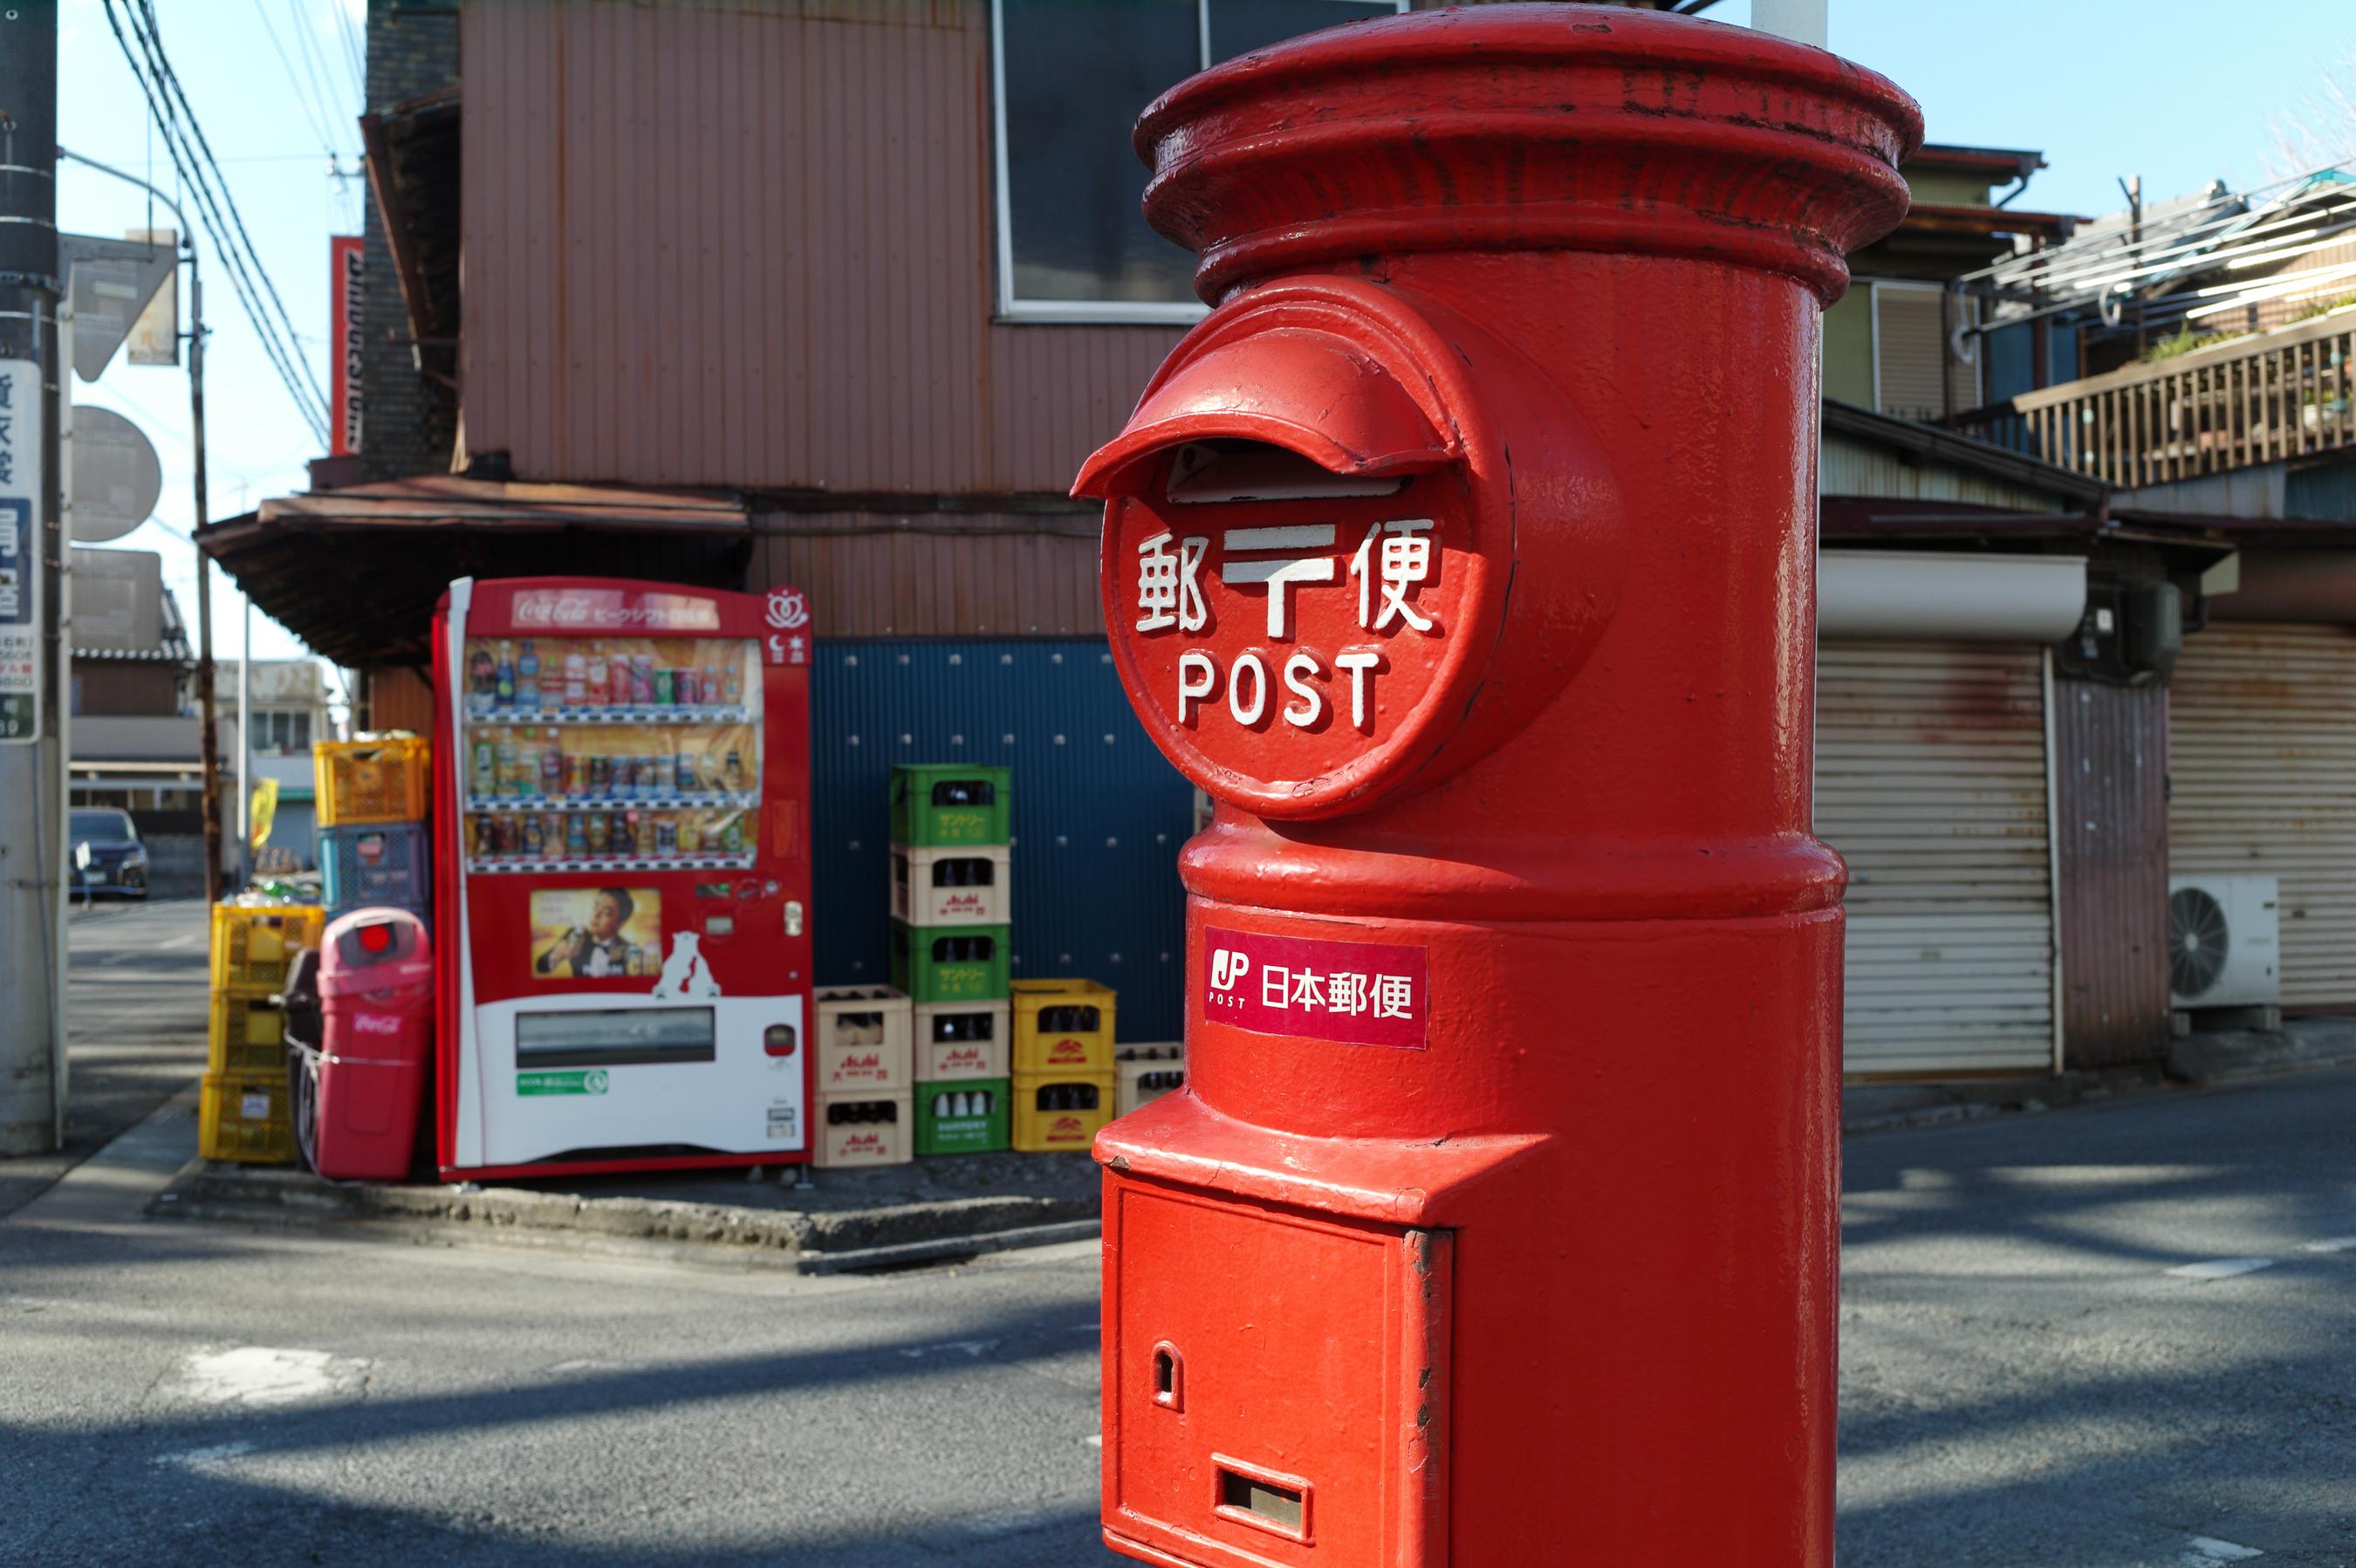 f:id:aoyama-takuro:20180212010828j:plain